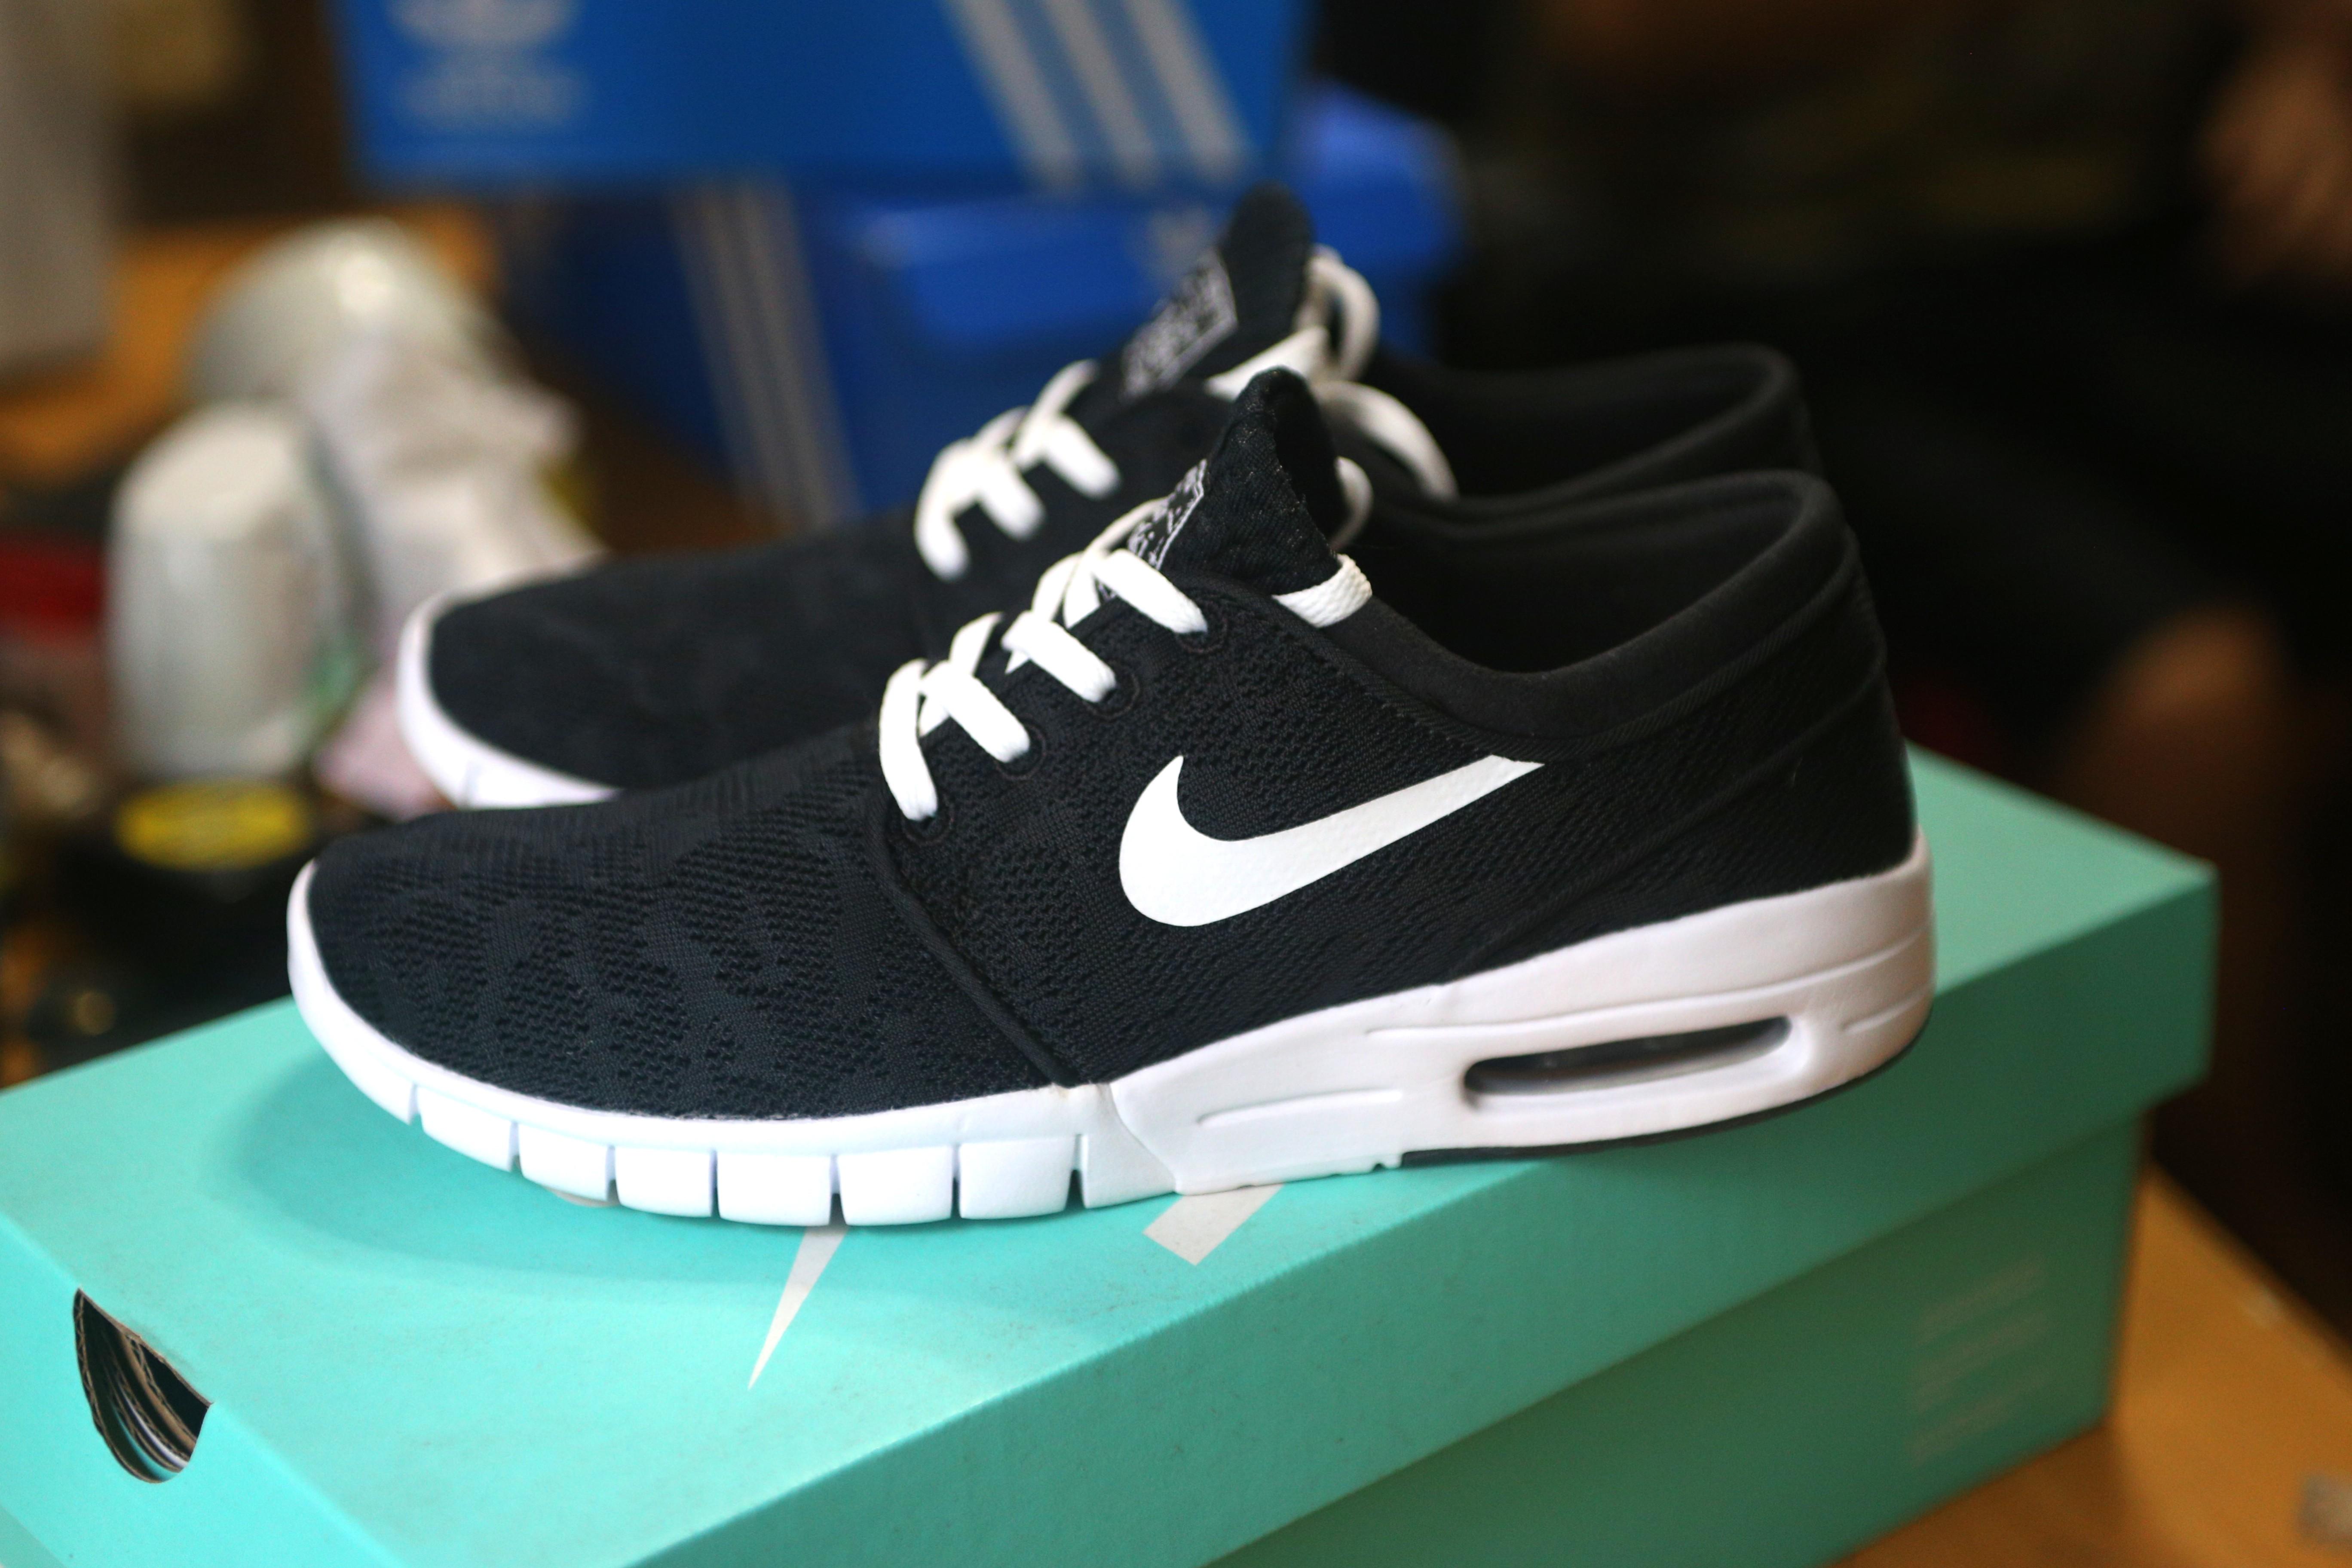 8c78fa9e524 Nike SB Stefan Janoski Max Black   White